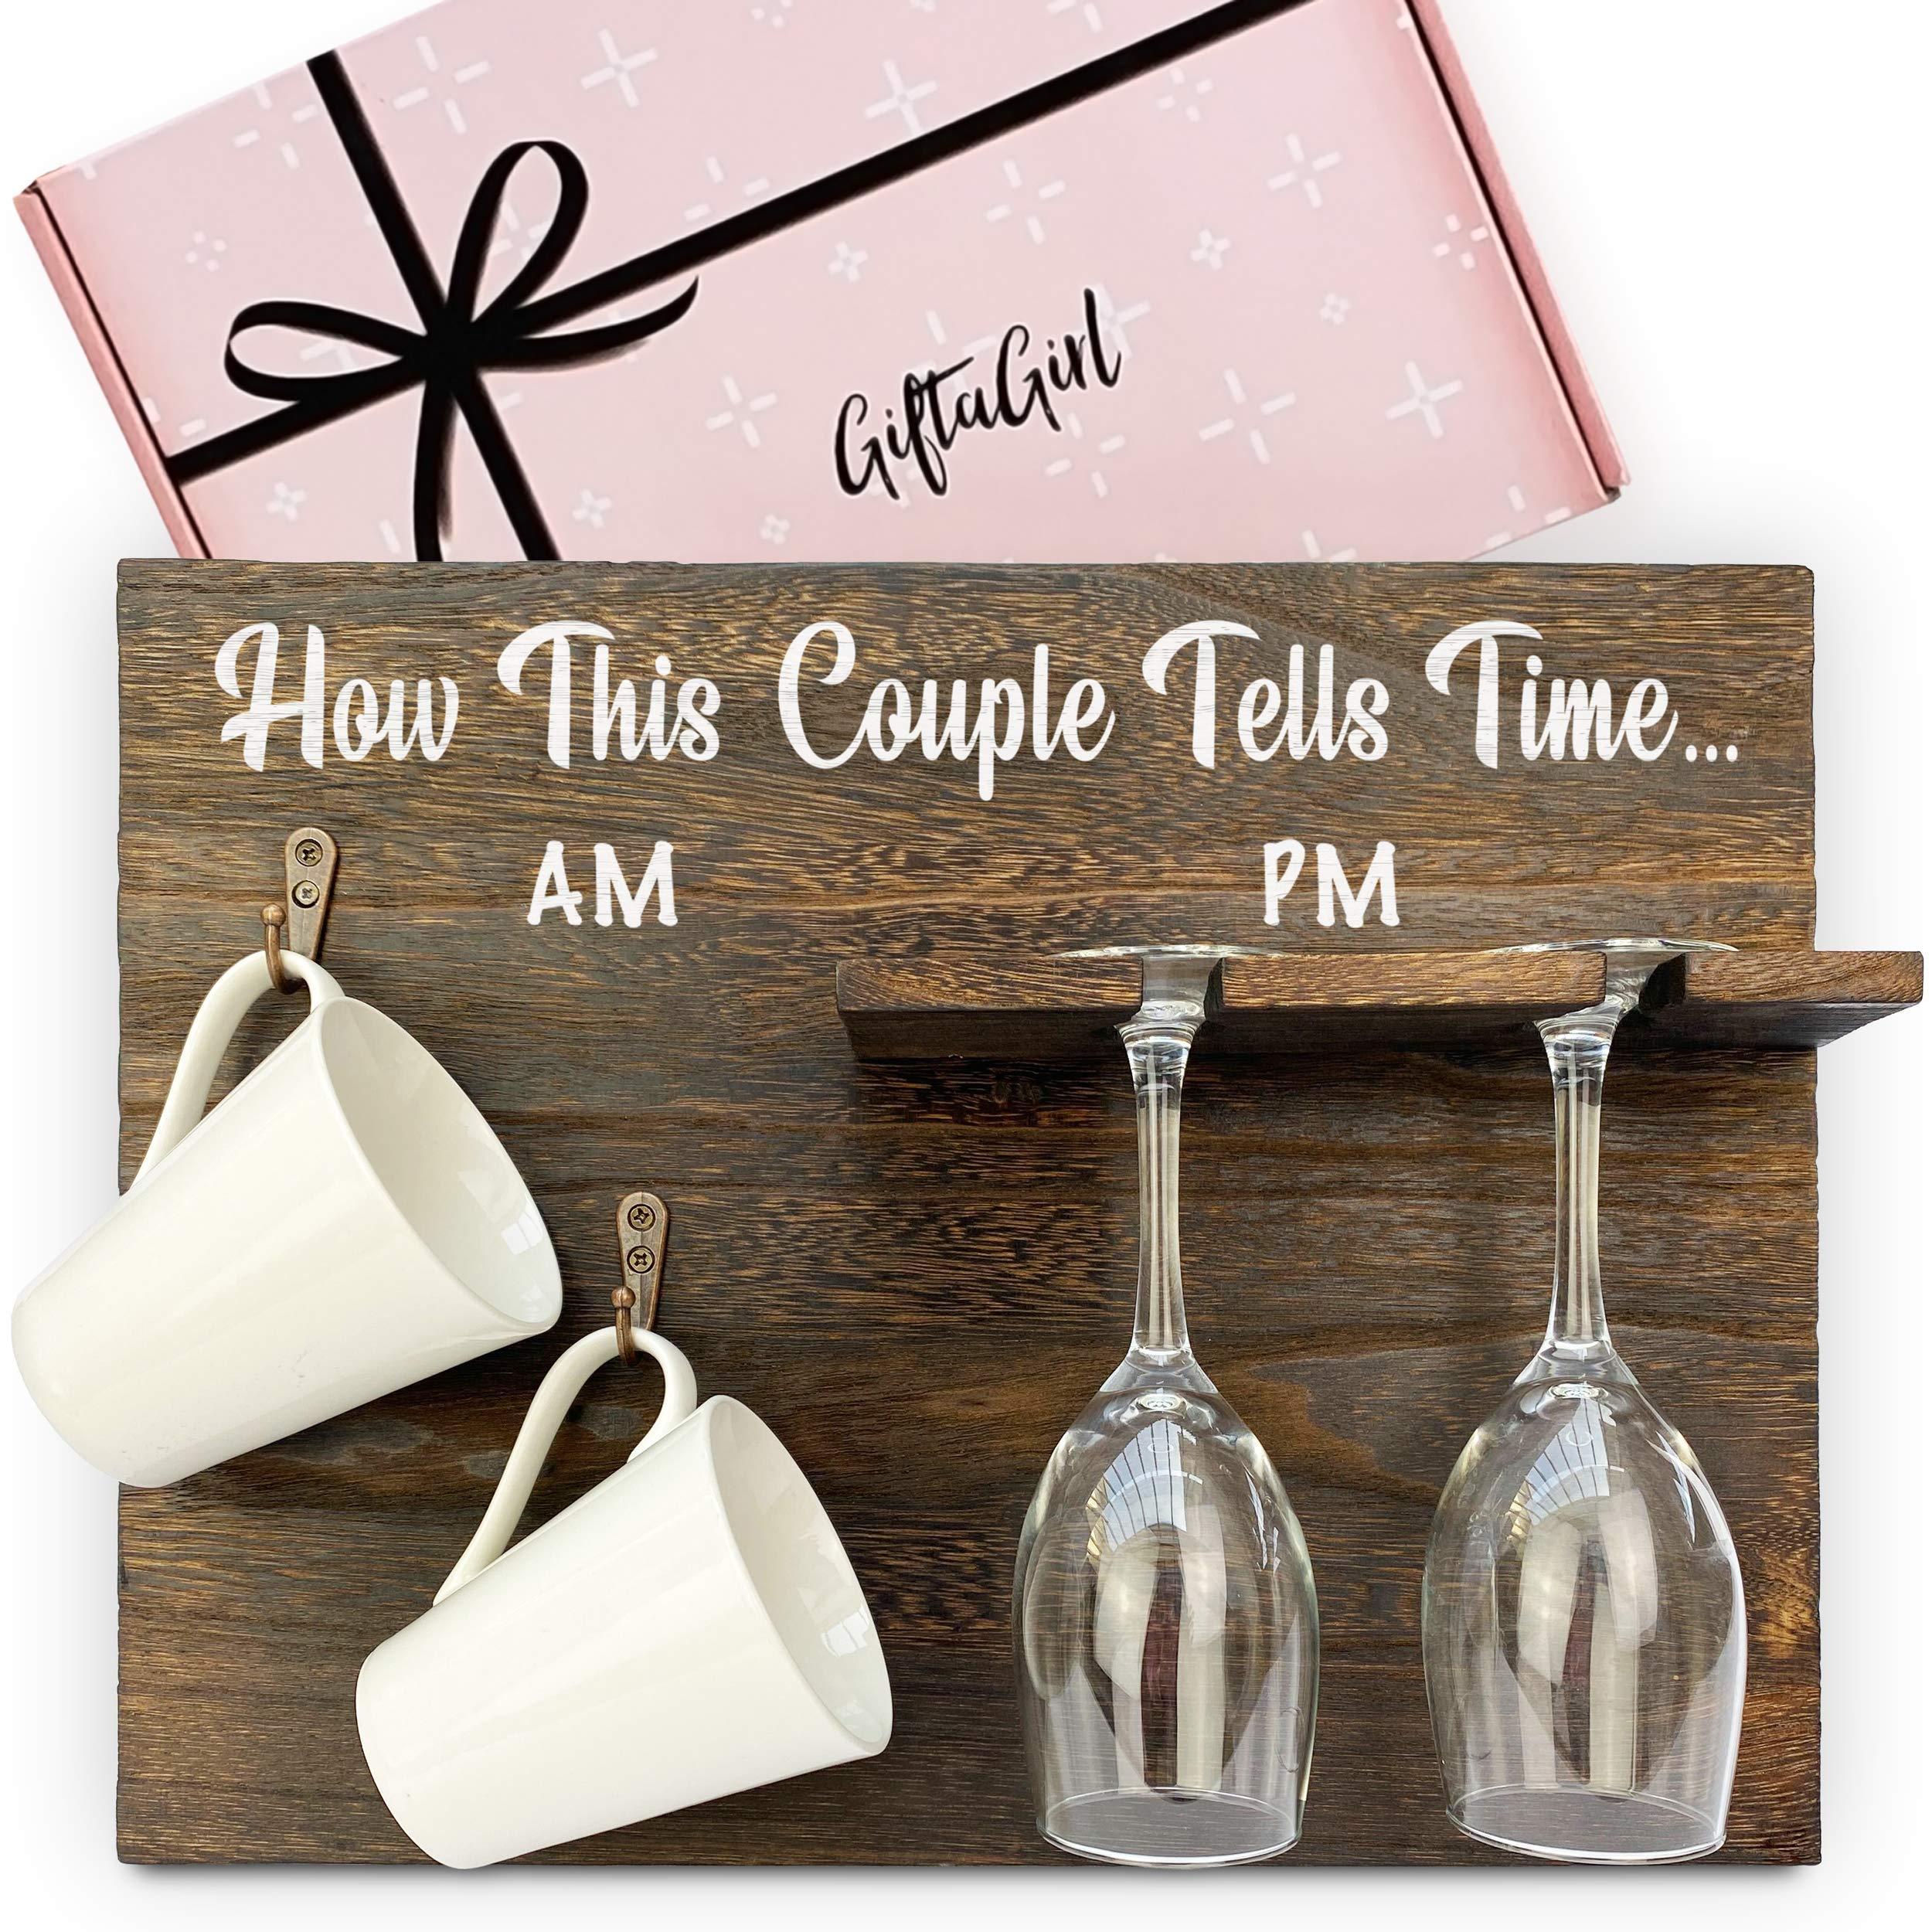 GIFTAGIRL Popular Engagement Gift for Couples or Wedding Gifts for Couple - Fun Couples Gifts for Husband and Wife. Engagement Gifts, Wedding Gift or Housewarming Gift. Mugs - Glasses Not Included